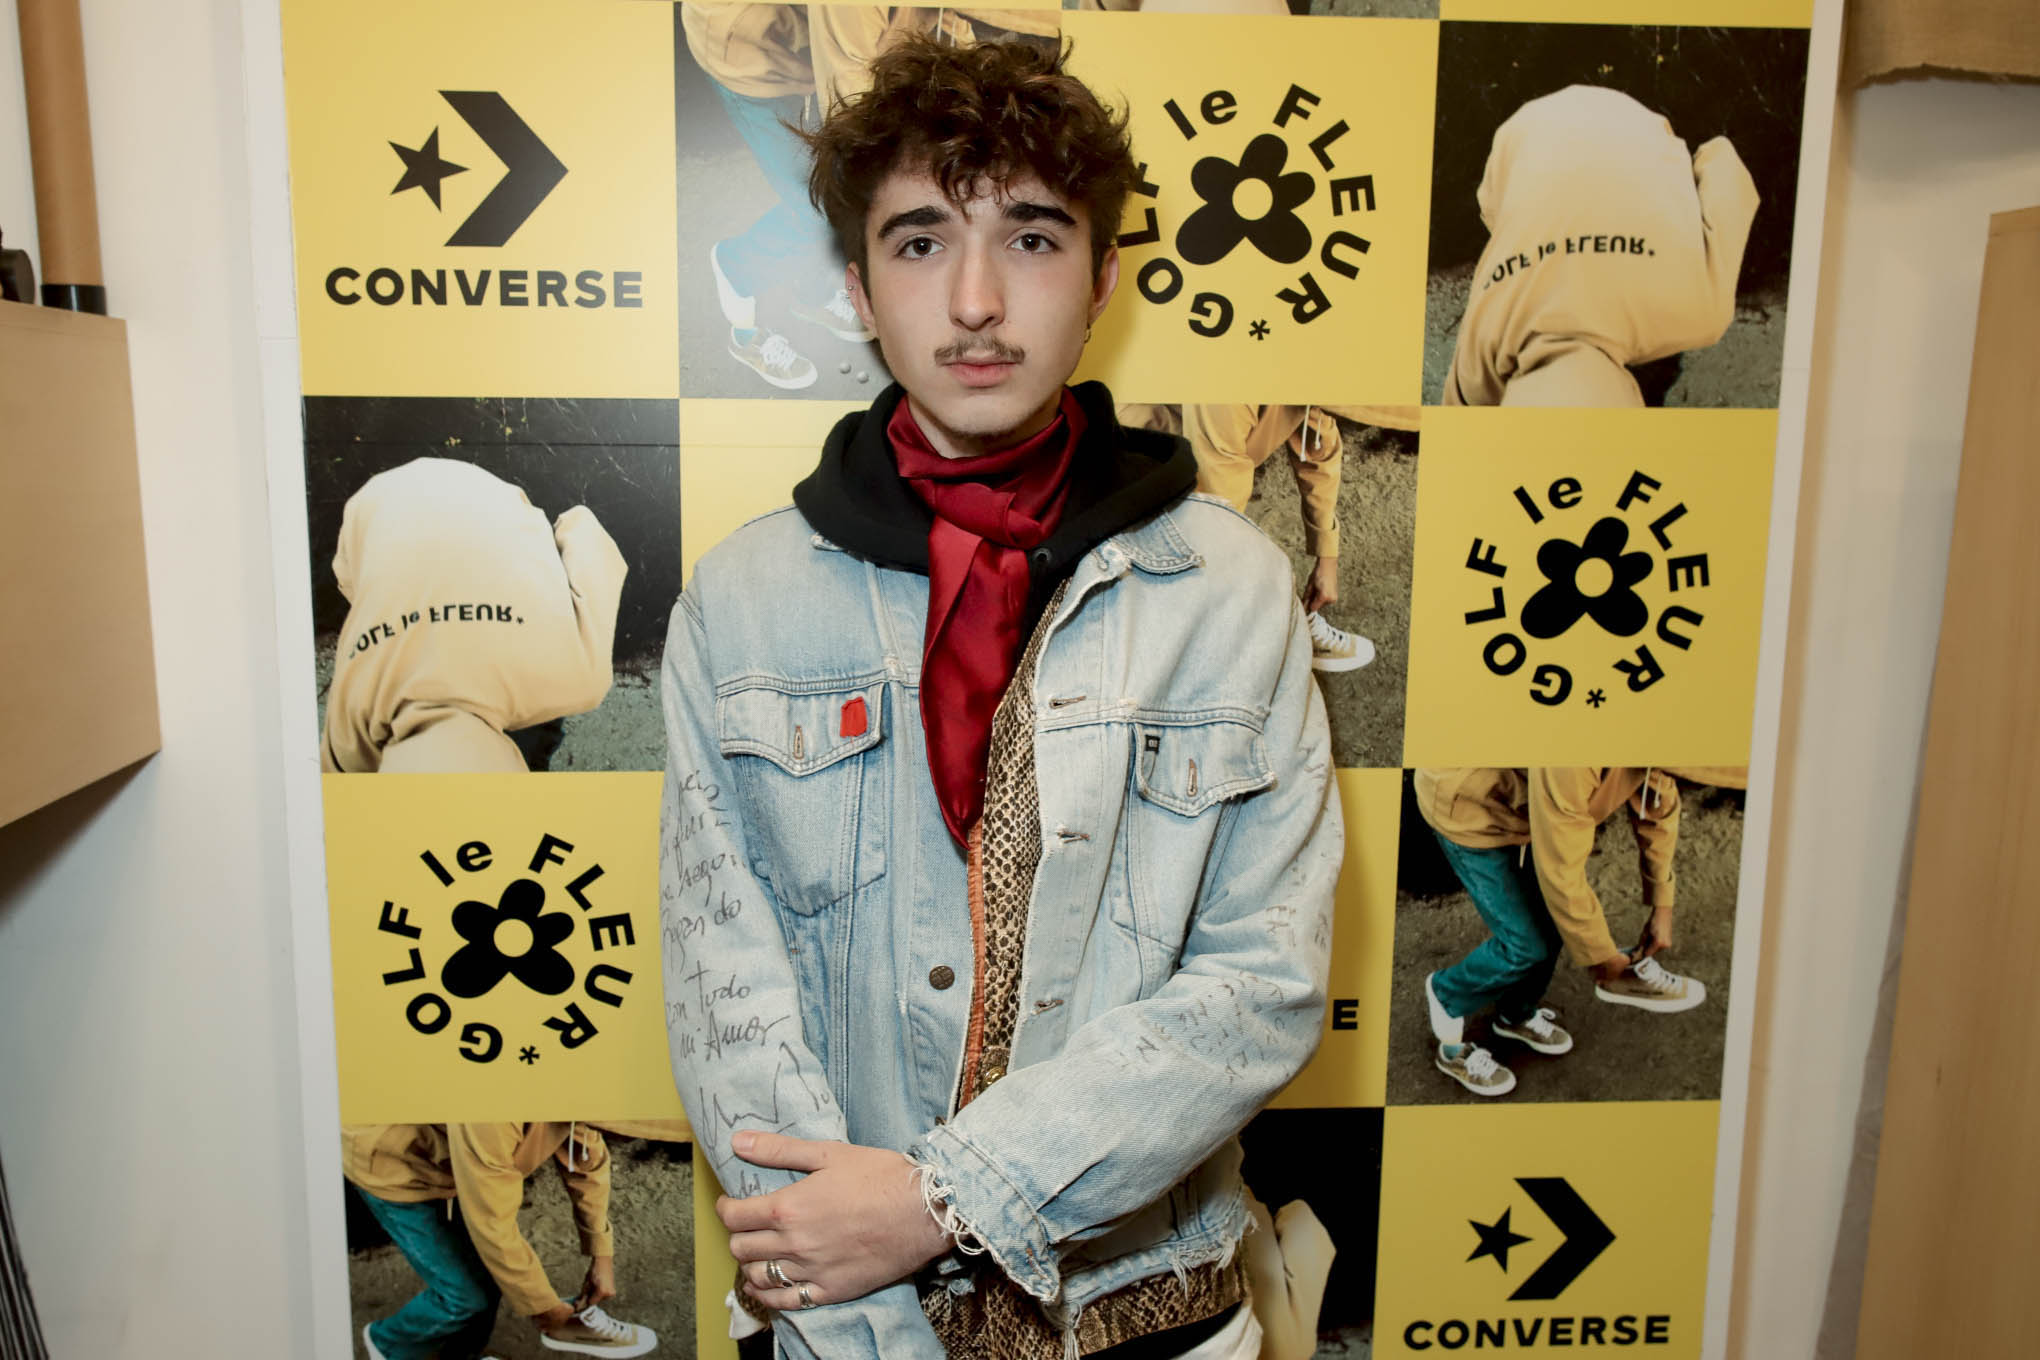 Converse_Tyler_The_Creator_loqueva (8)